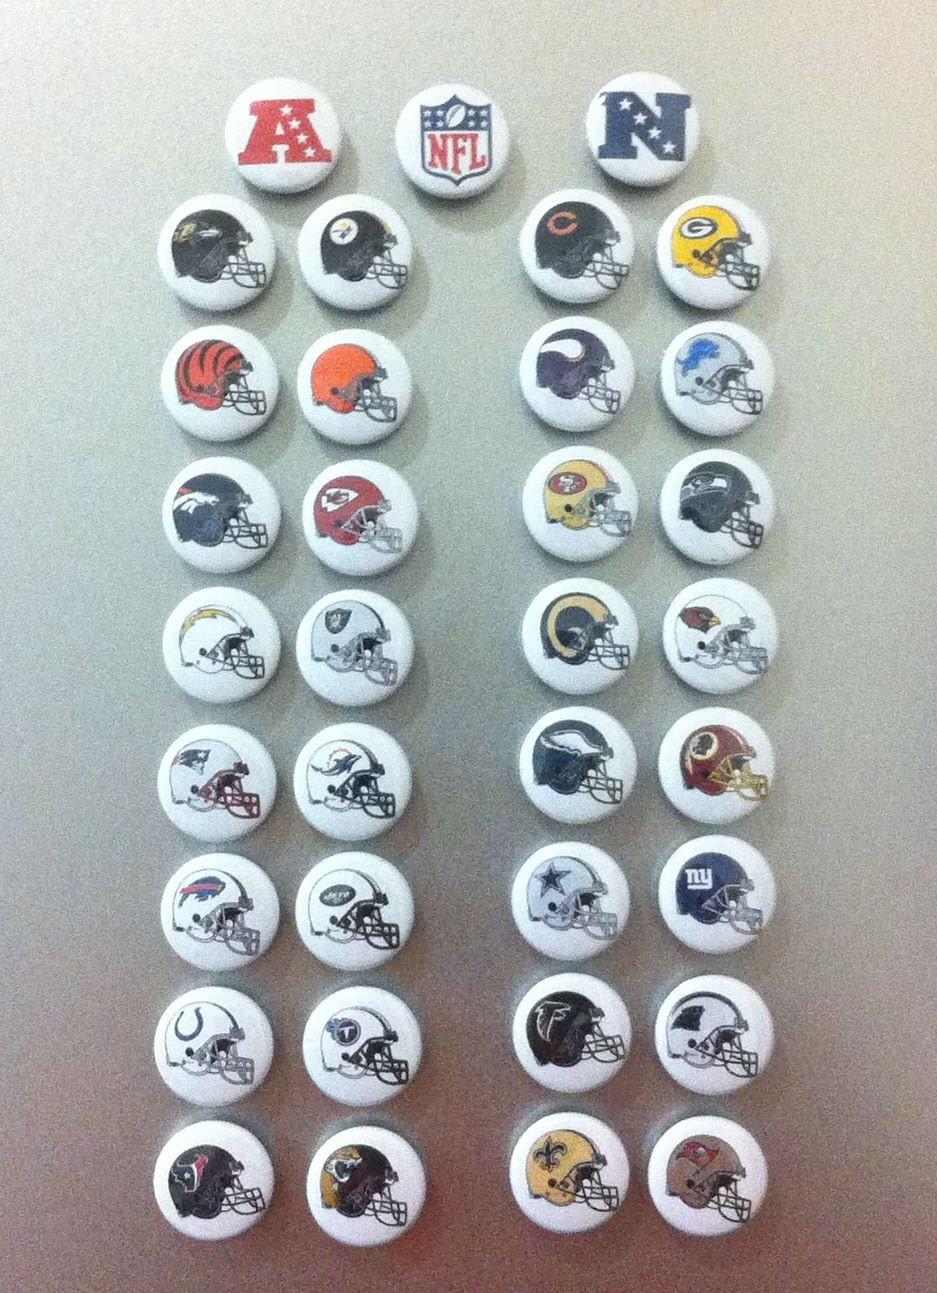 Nfl Team Helmet Kitchen Magnet Set By Circlesandwords On Etsy